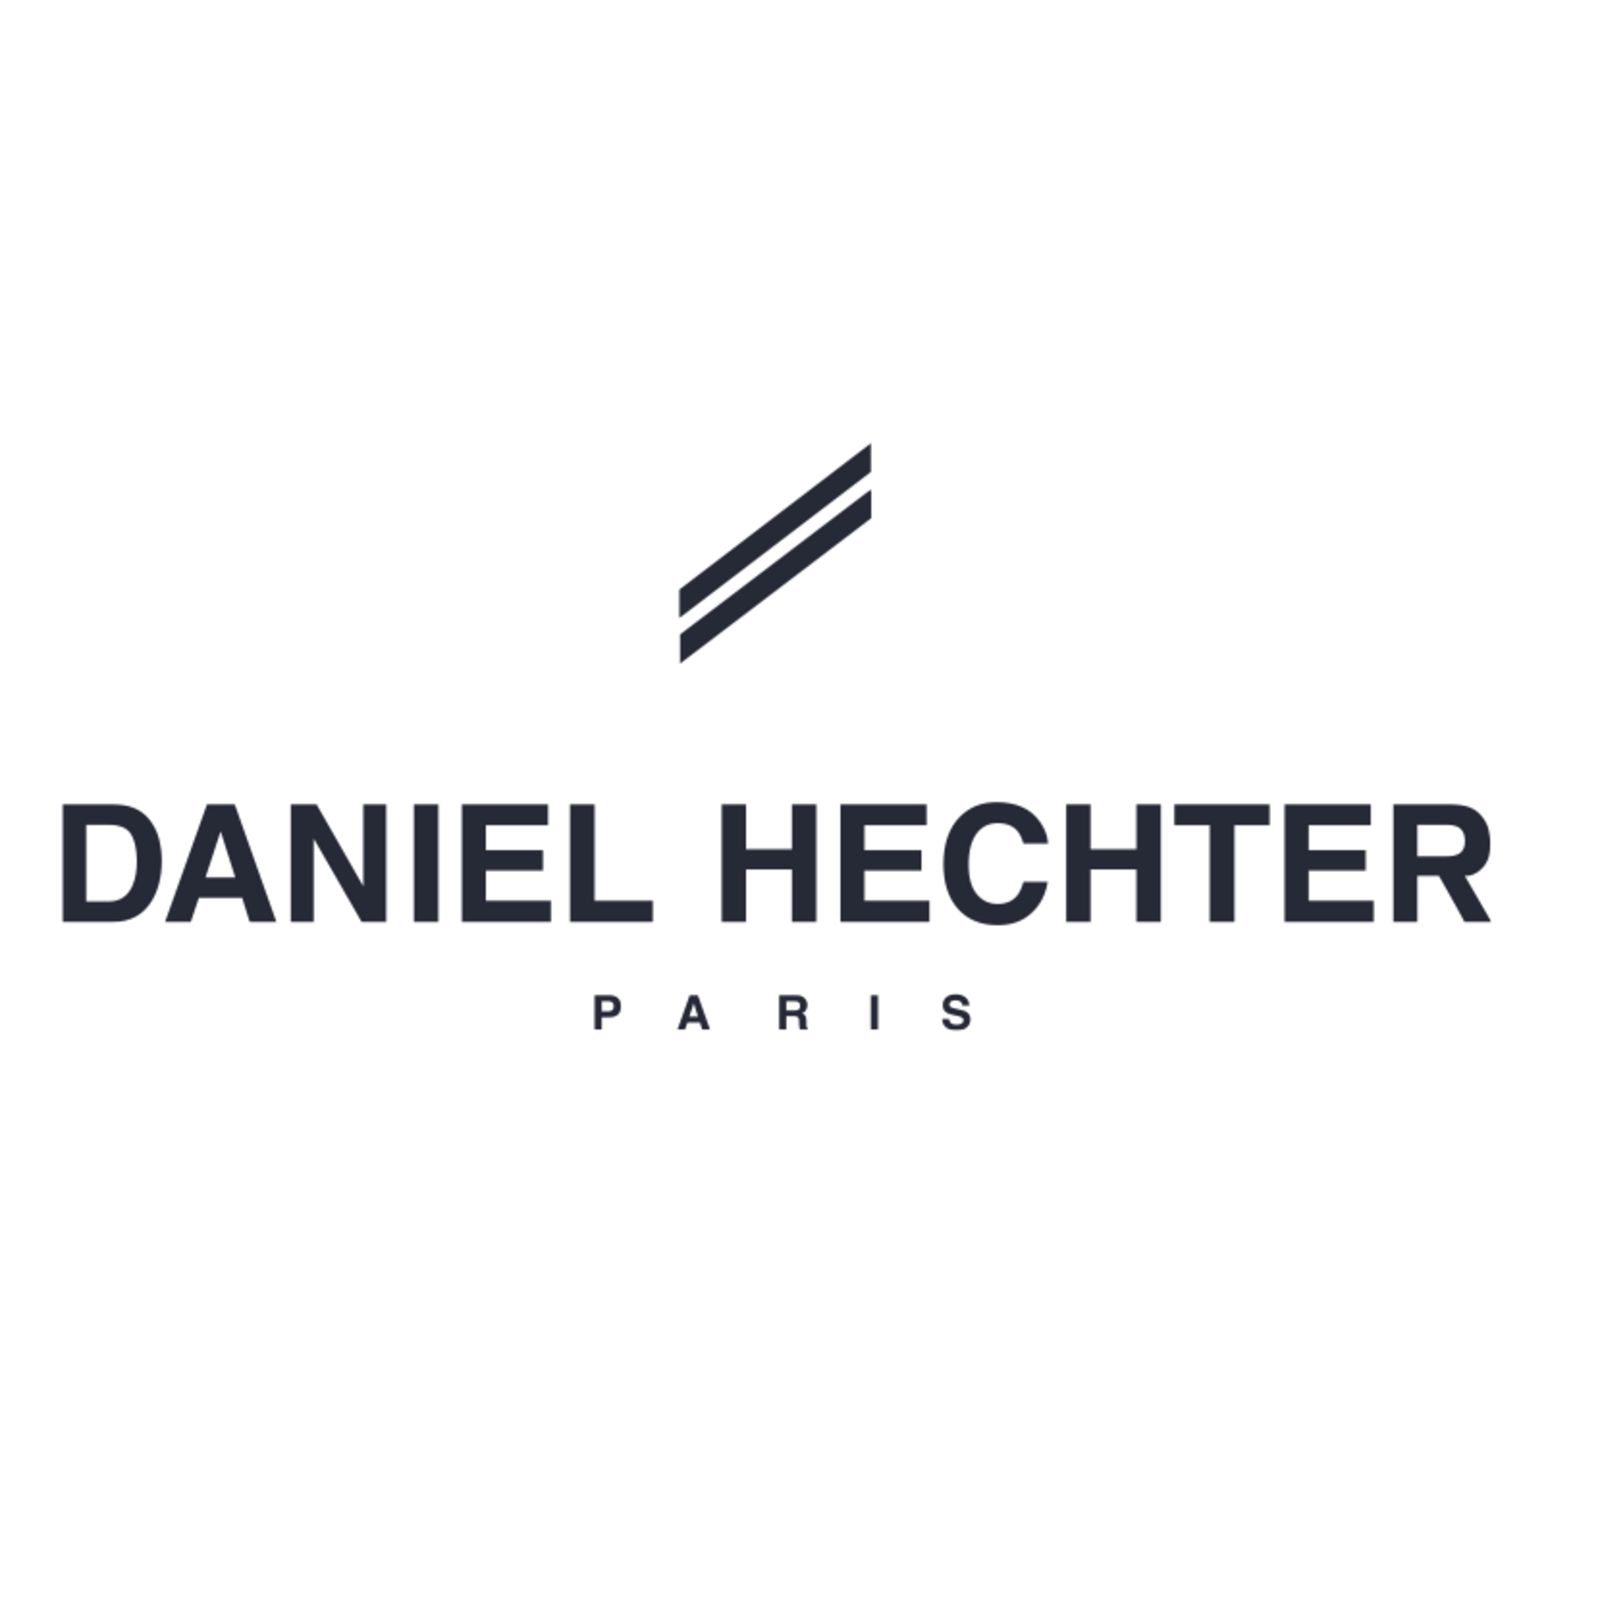 DANIEL HECHTER (Bild 1)